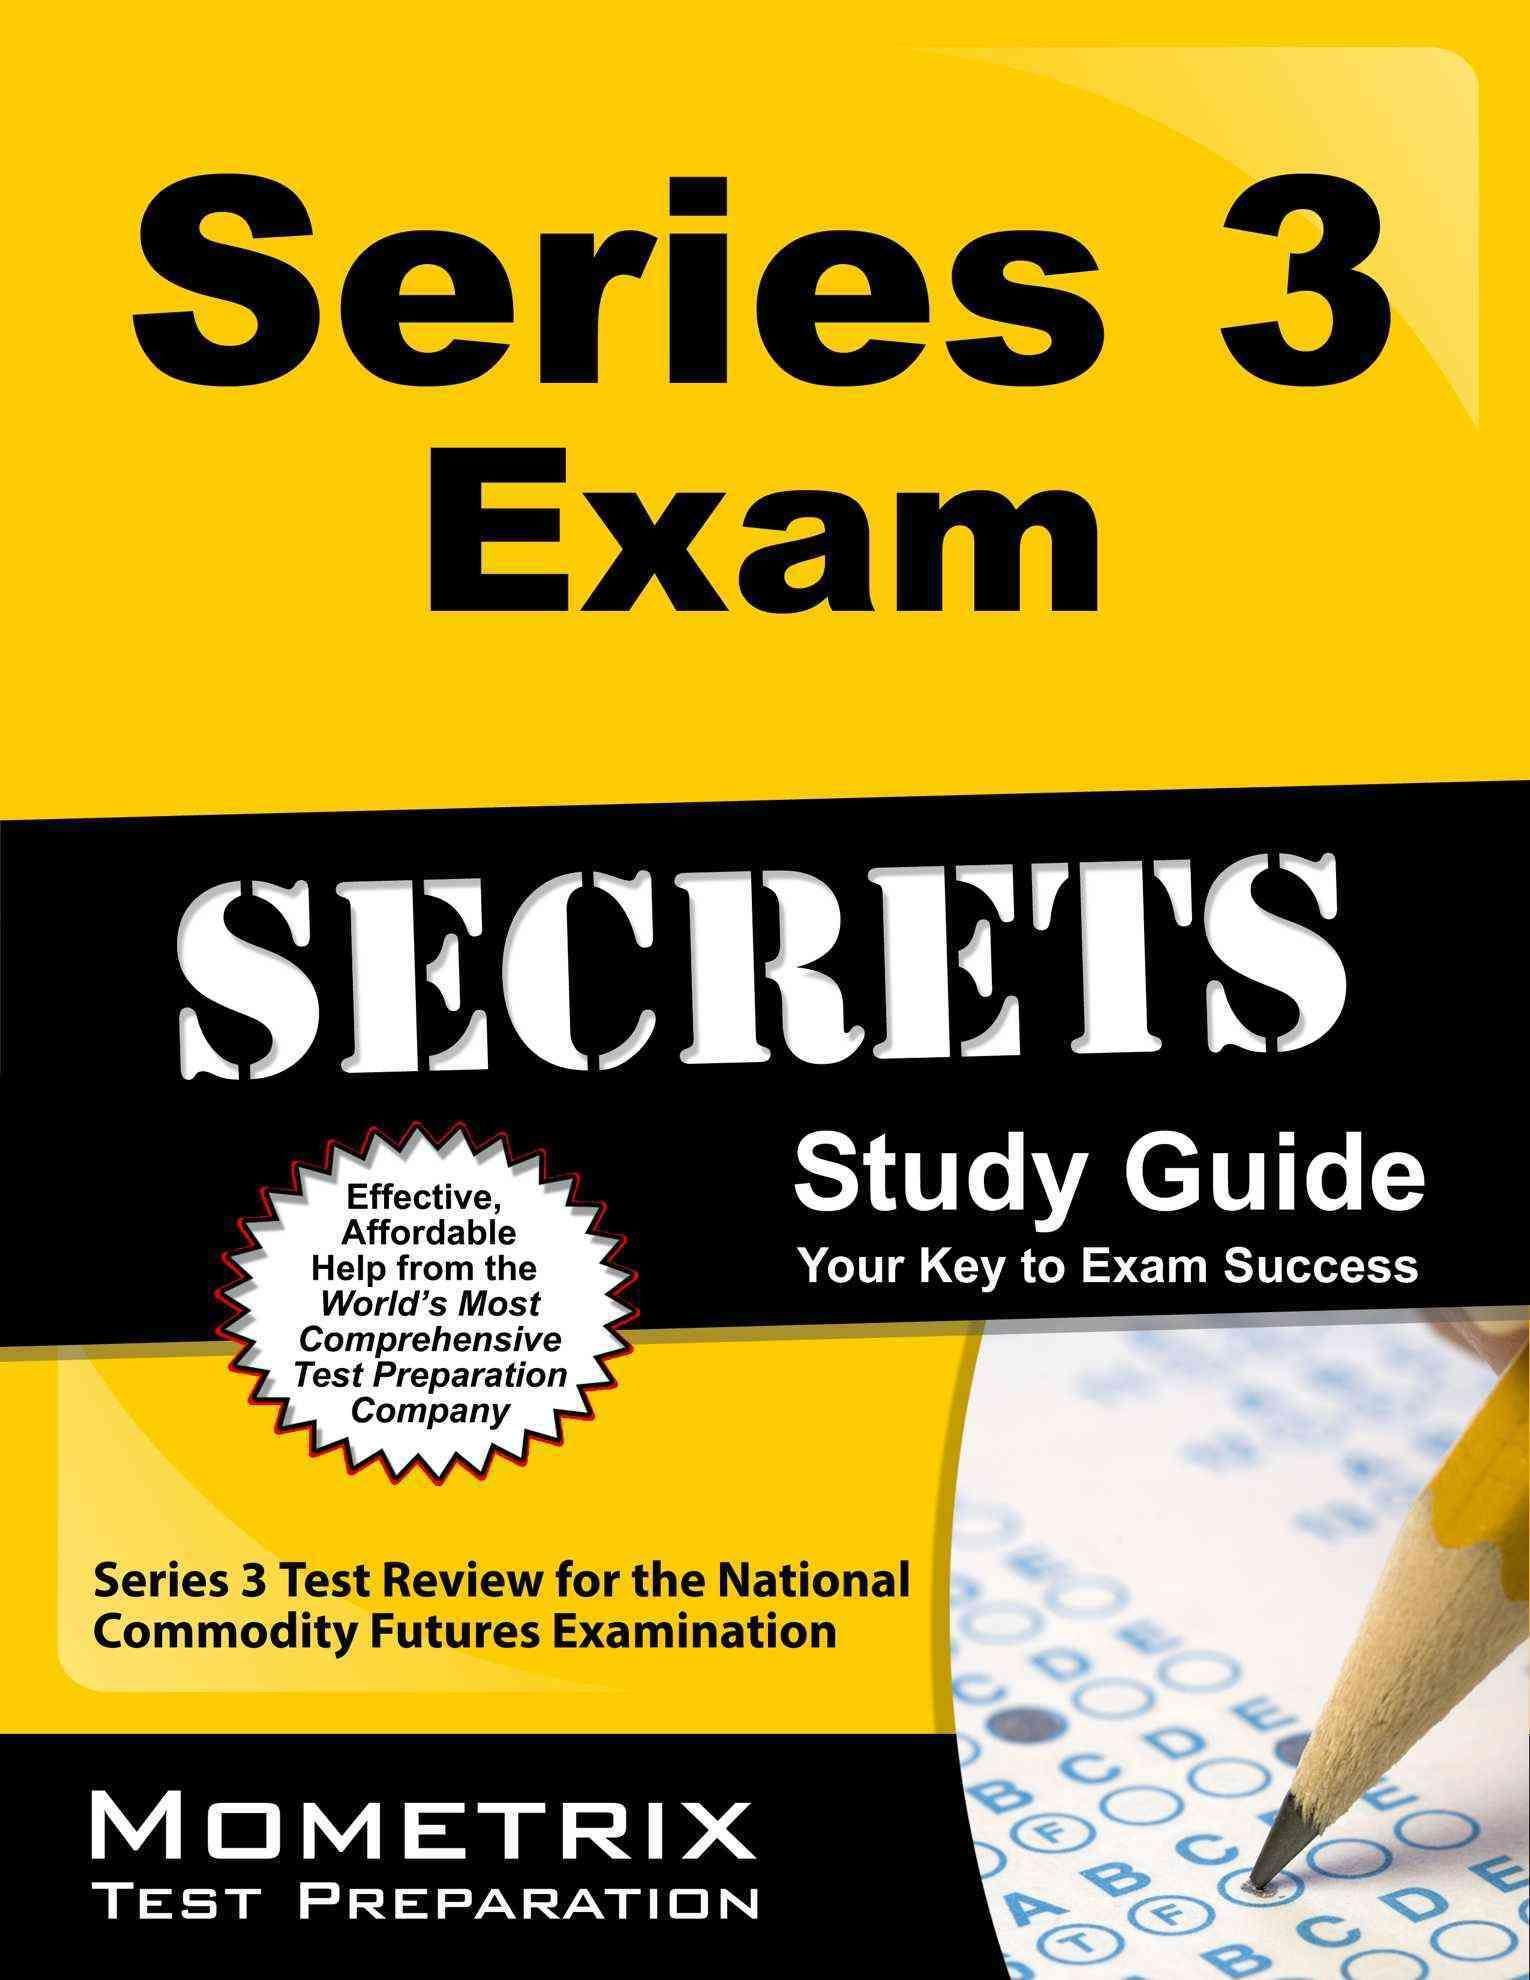 Series 3 Exam Secrets Your Key To Exam Success Series 3 Test